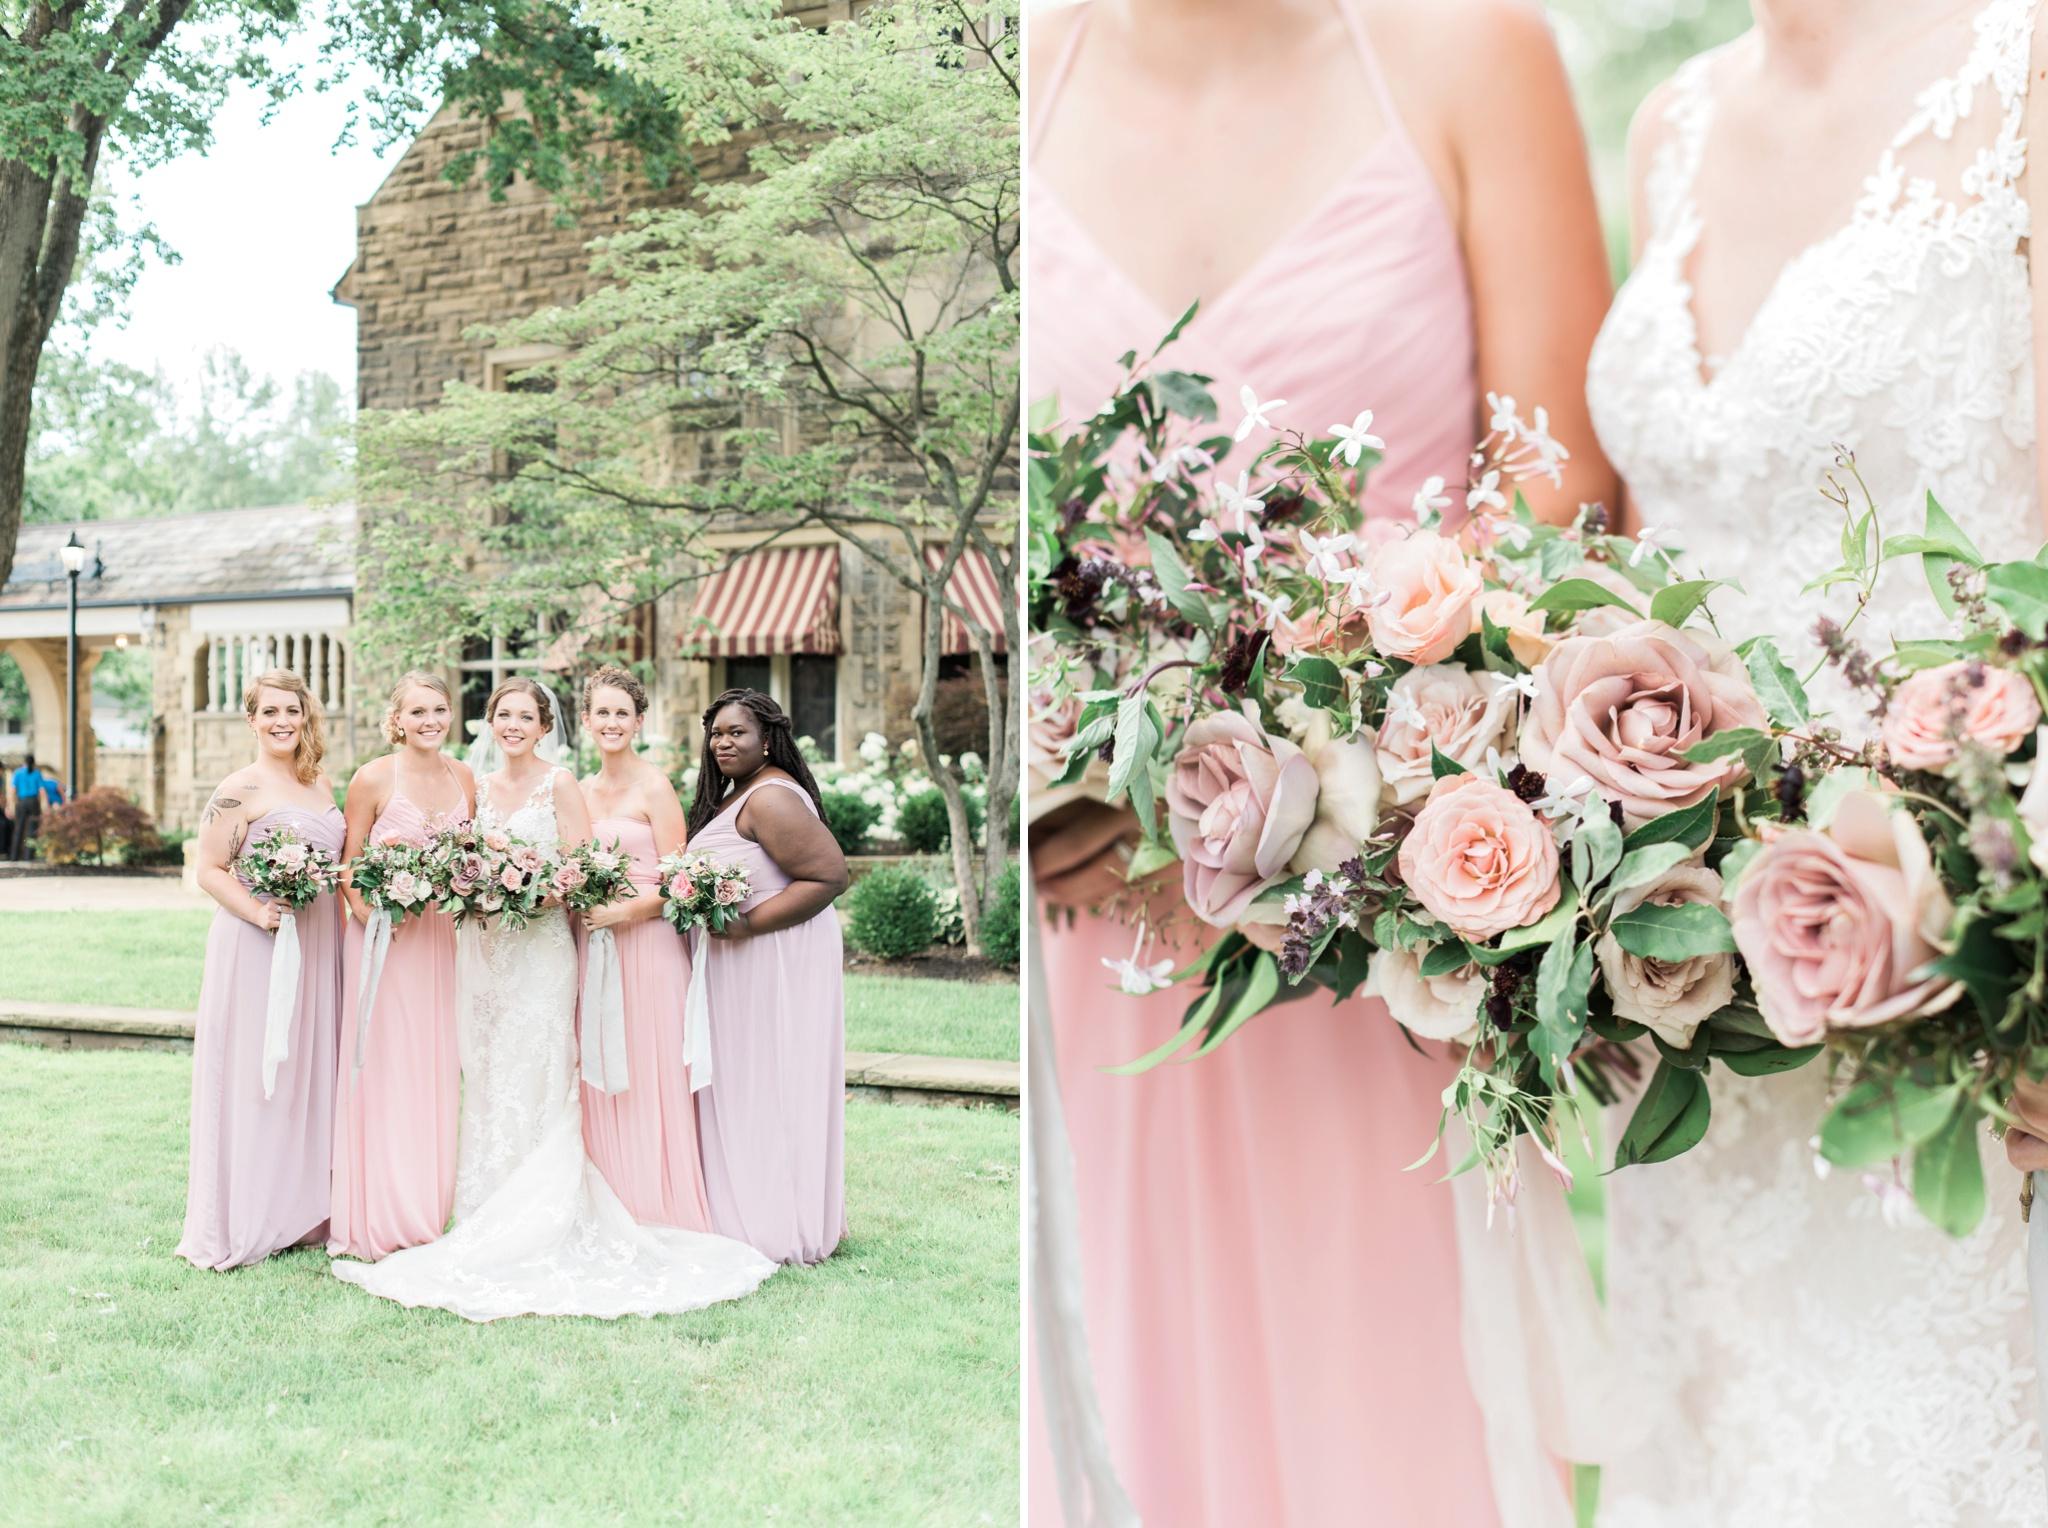 granville-inn-wedding-columbus-ohio-photographer_0053.jpg